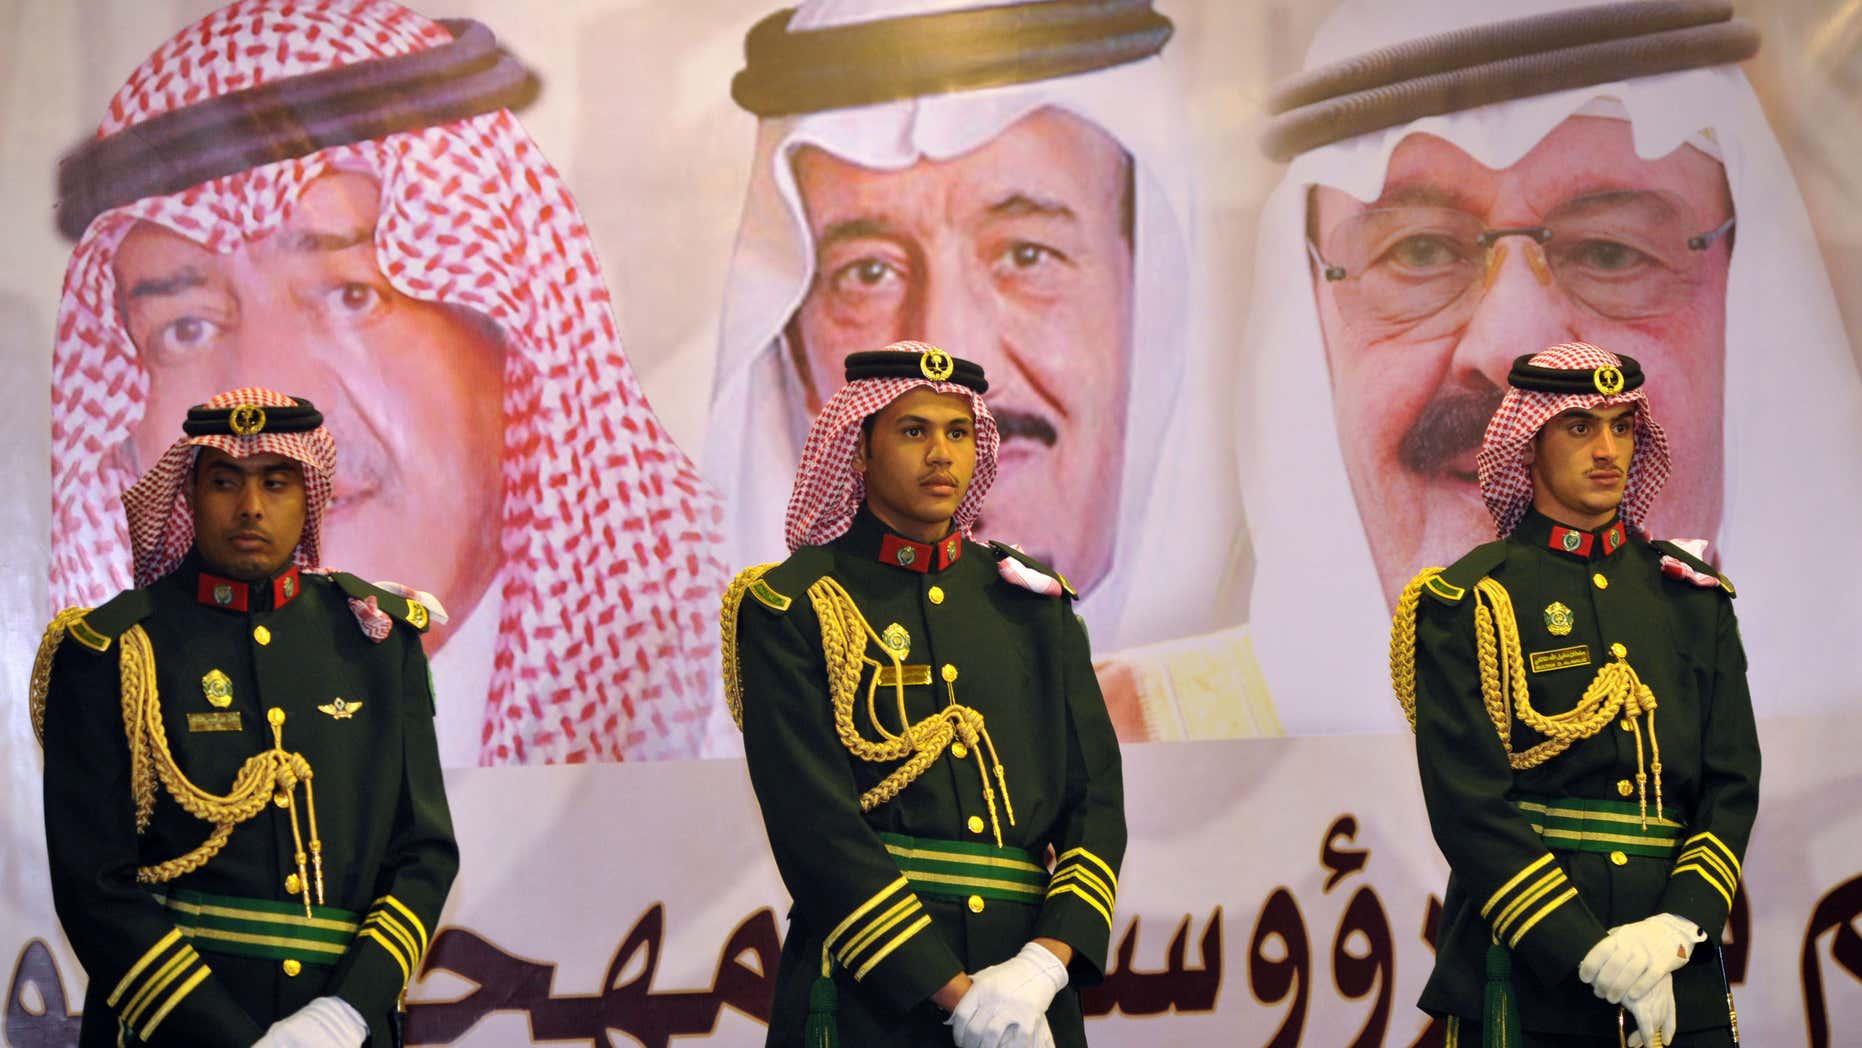 Feb. 18, 2014: Saudi royal guards stand on duty in front of portraits of King Abdullah bin Abdulaziz, right, then Crown Prince Salman bin Abdulaziz, center, and Muqrin bin Abdulaziz during a culture festival in Riyadh, Saudi Arabia.